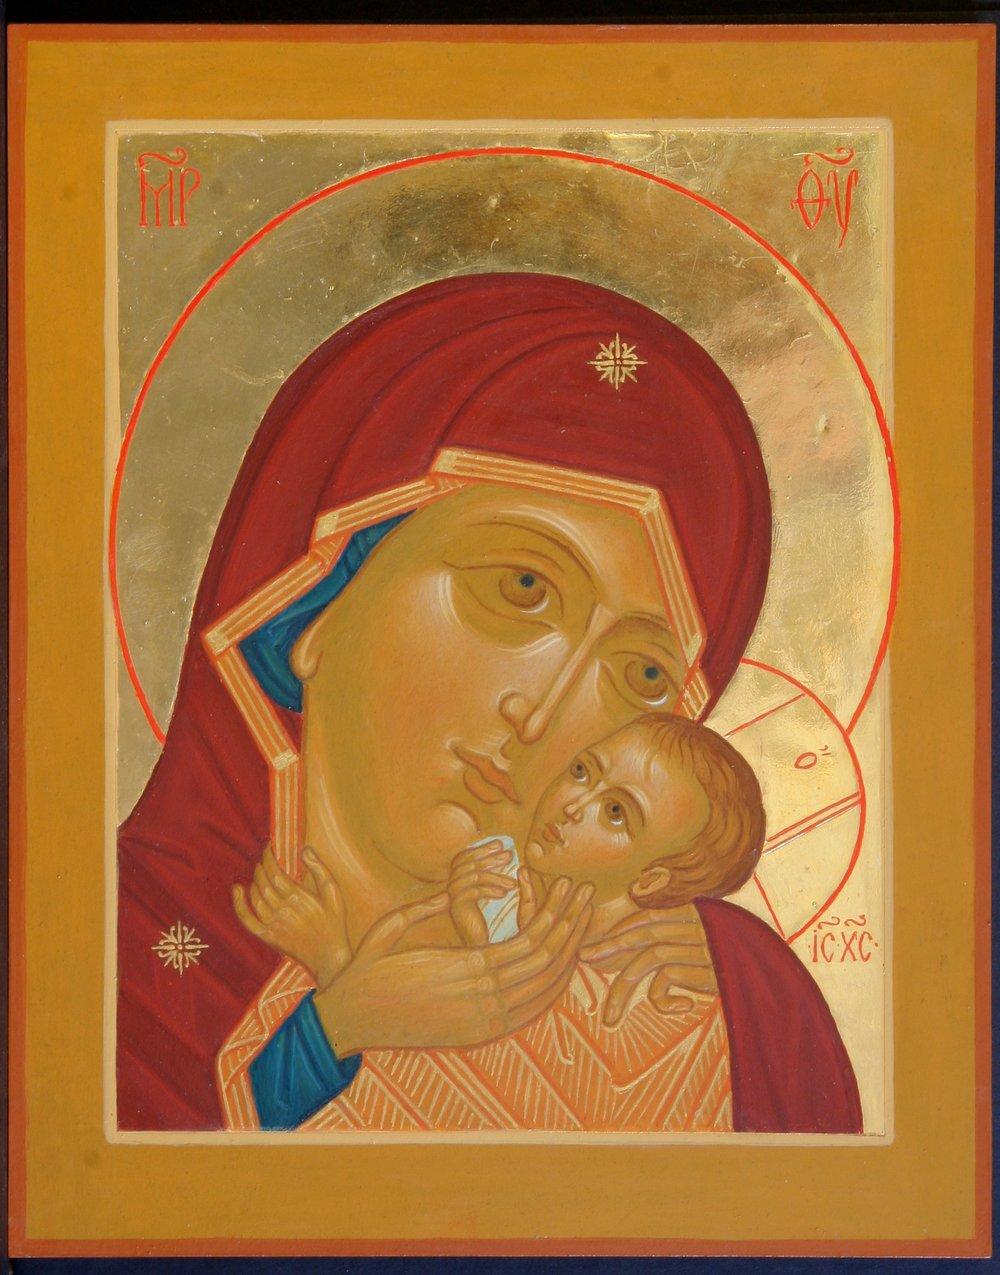 Theotokos of Tenderness